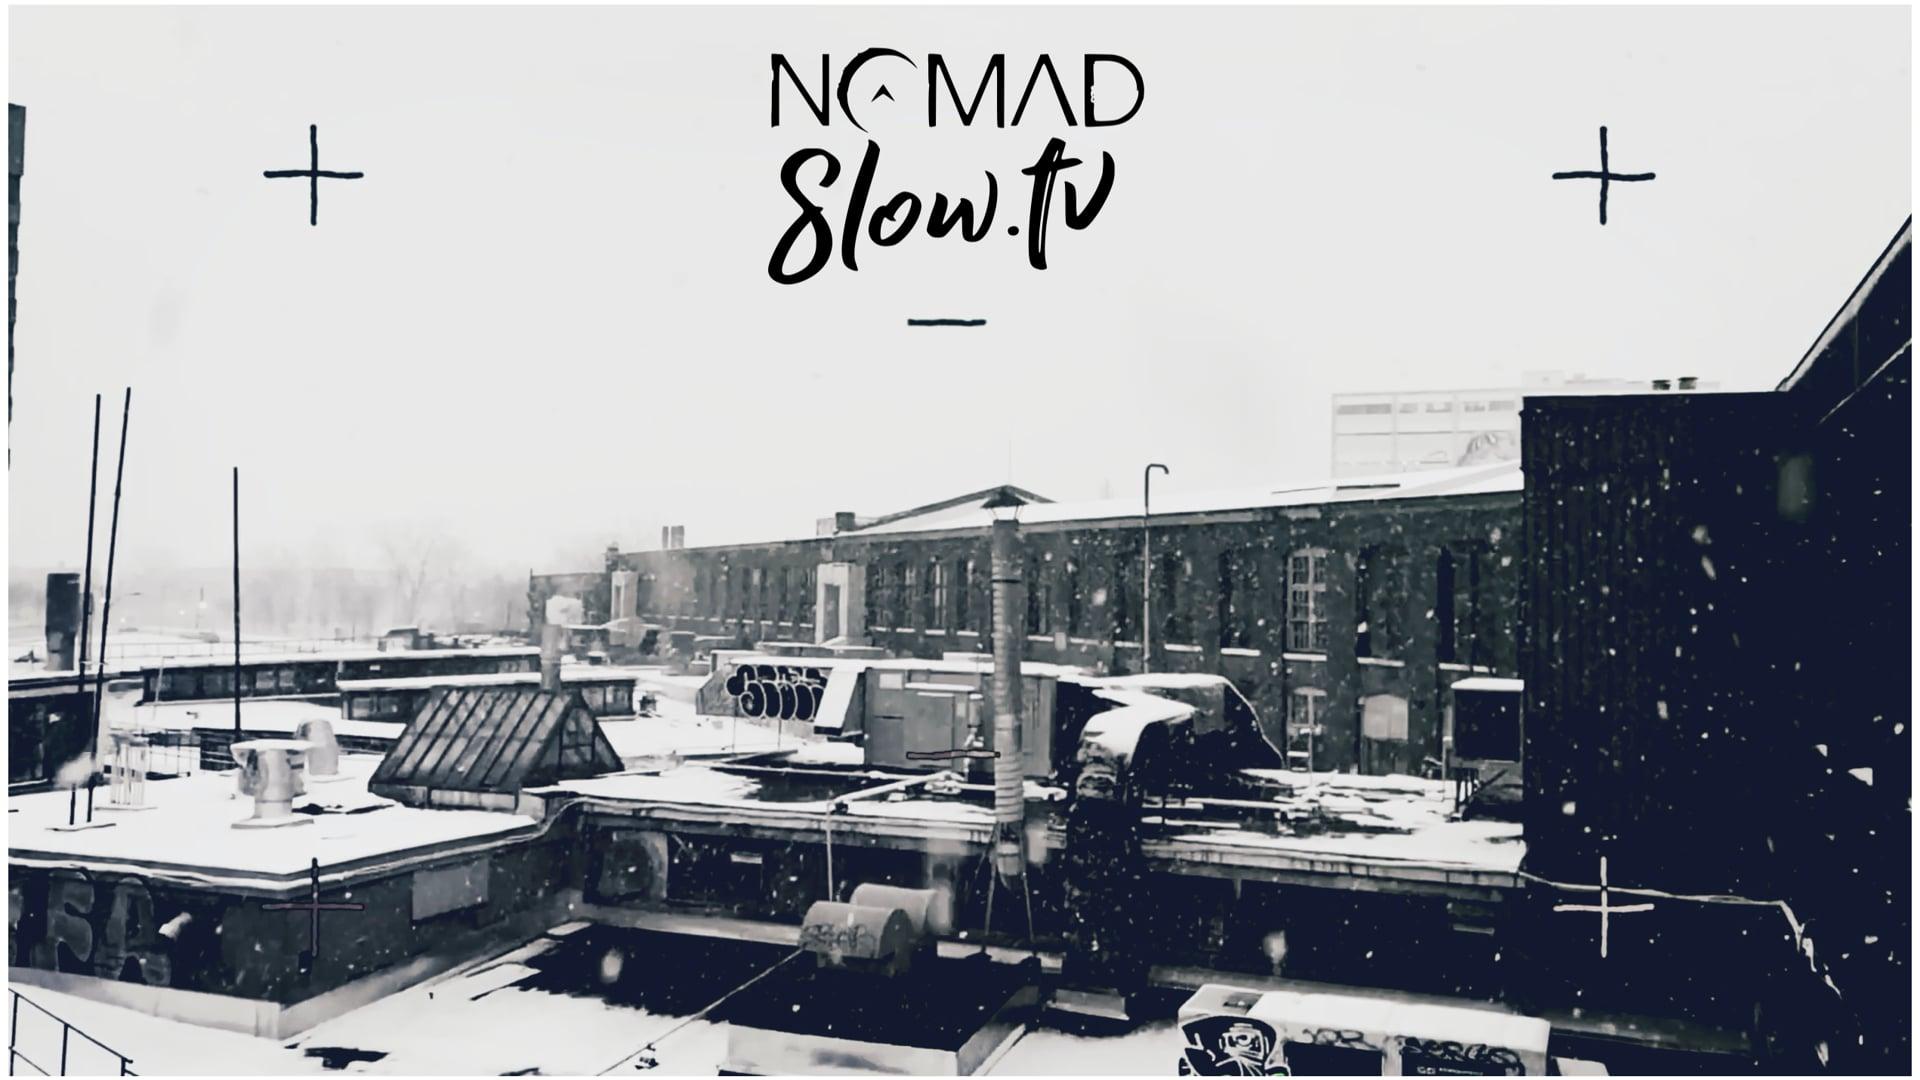 Winter Walk to NOMAD - slowTV